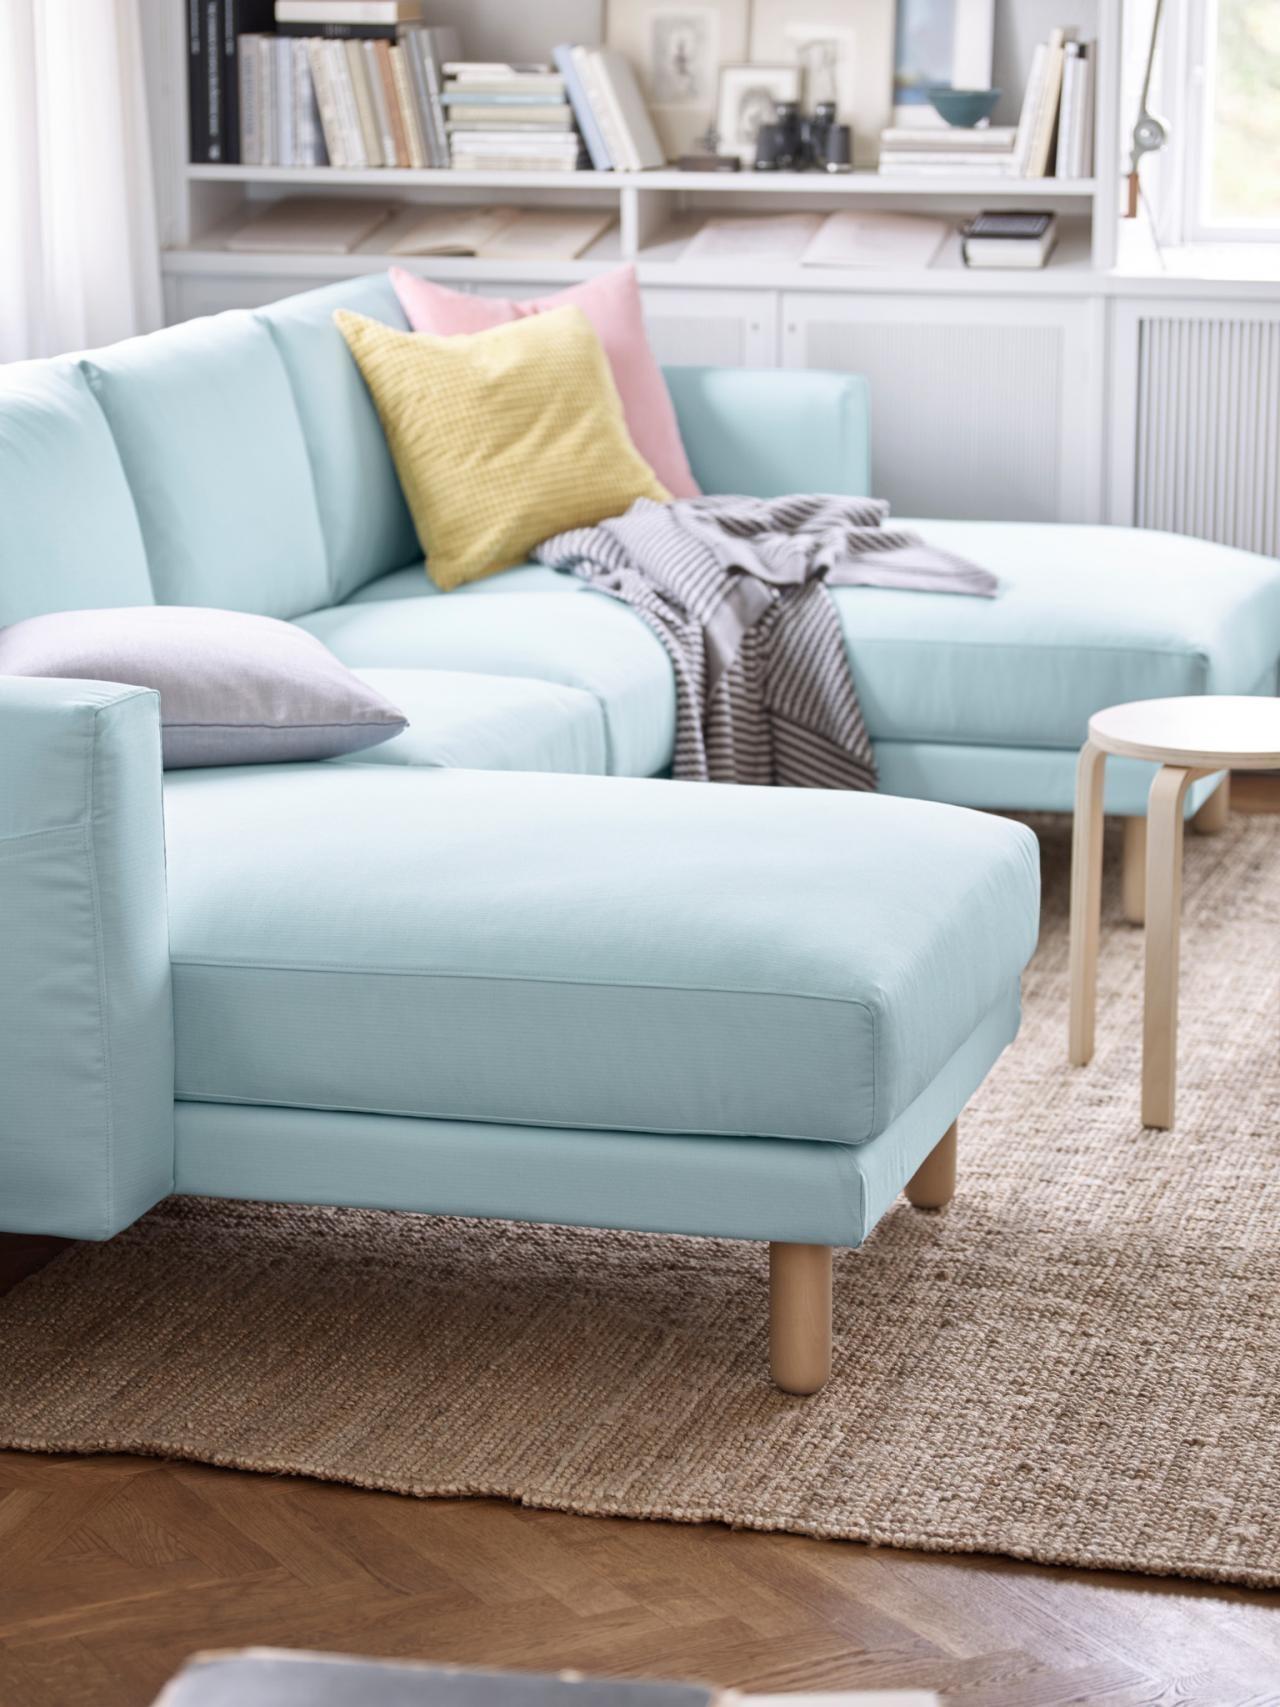 5 Apartment Sized Sofas That Are Lifesavers | Hgtv's Decorating pertaining to Apartment Sofas